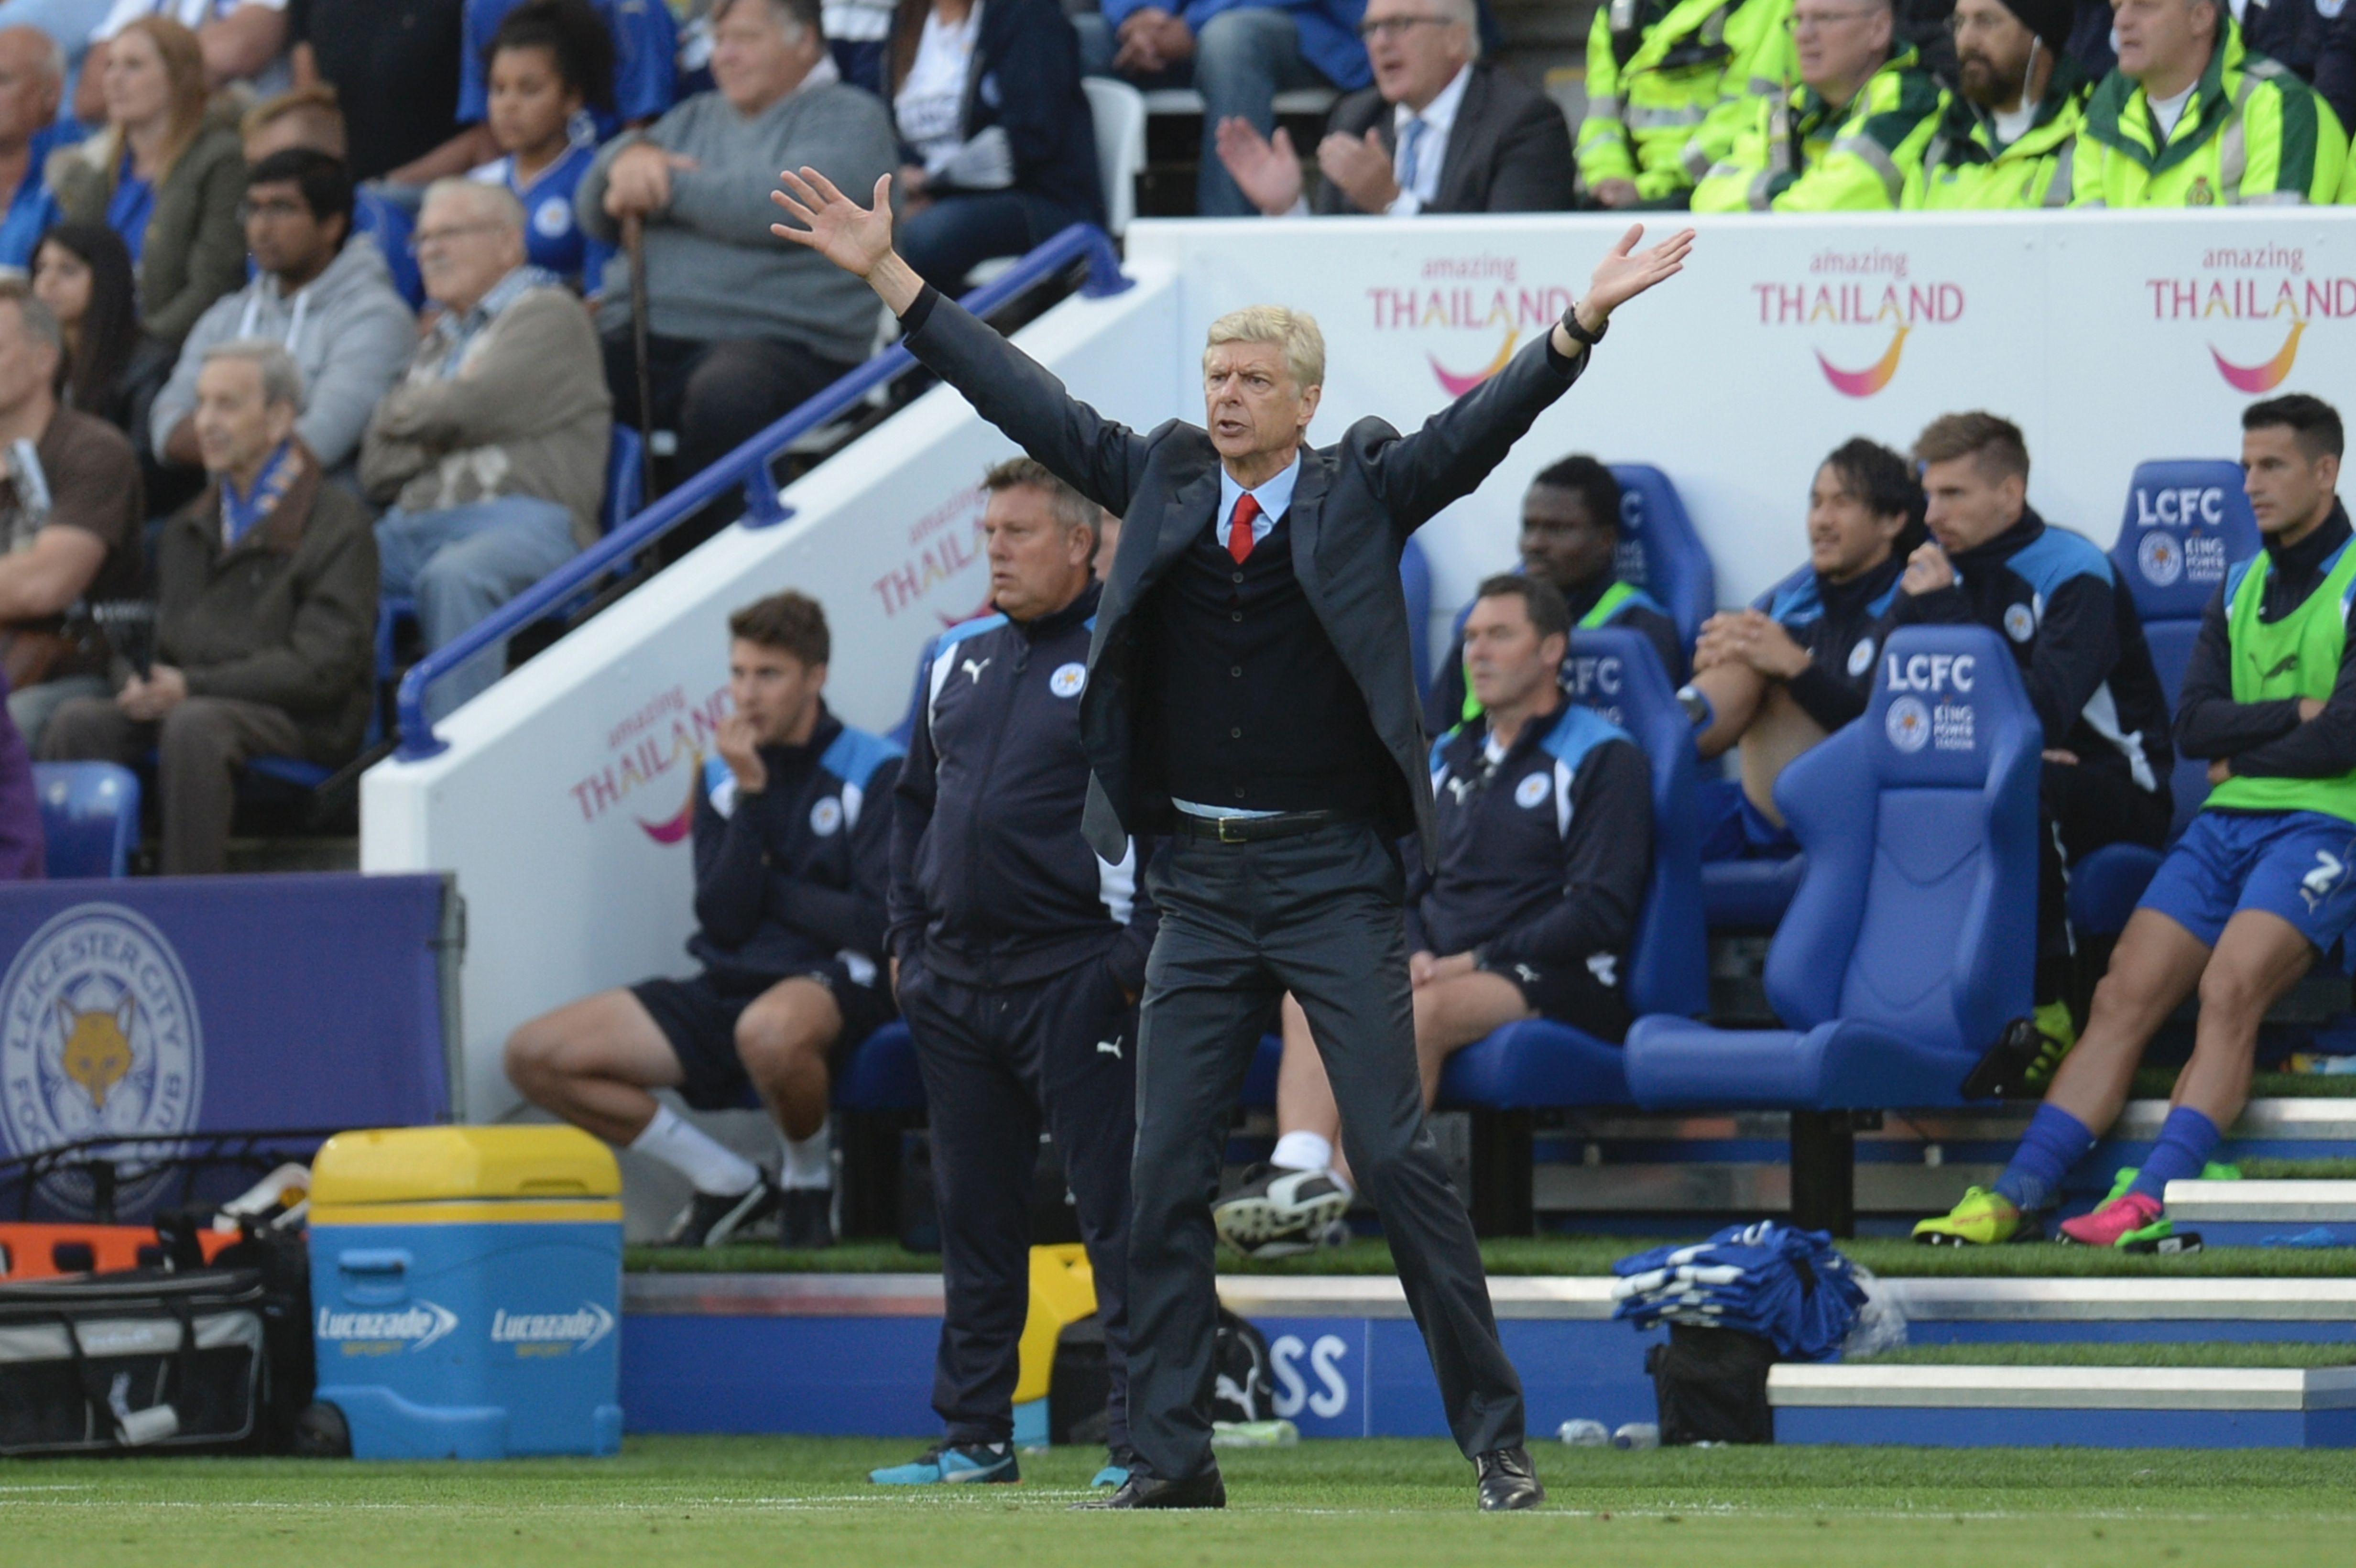 Arsene Wenger feels Arsenal are underdogs against Paris Saint-Germain in Champions League